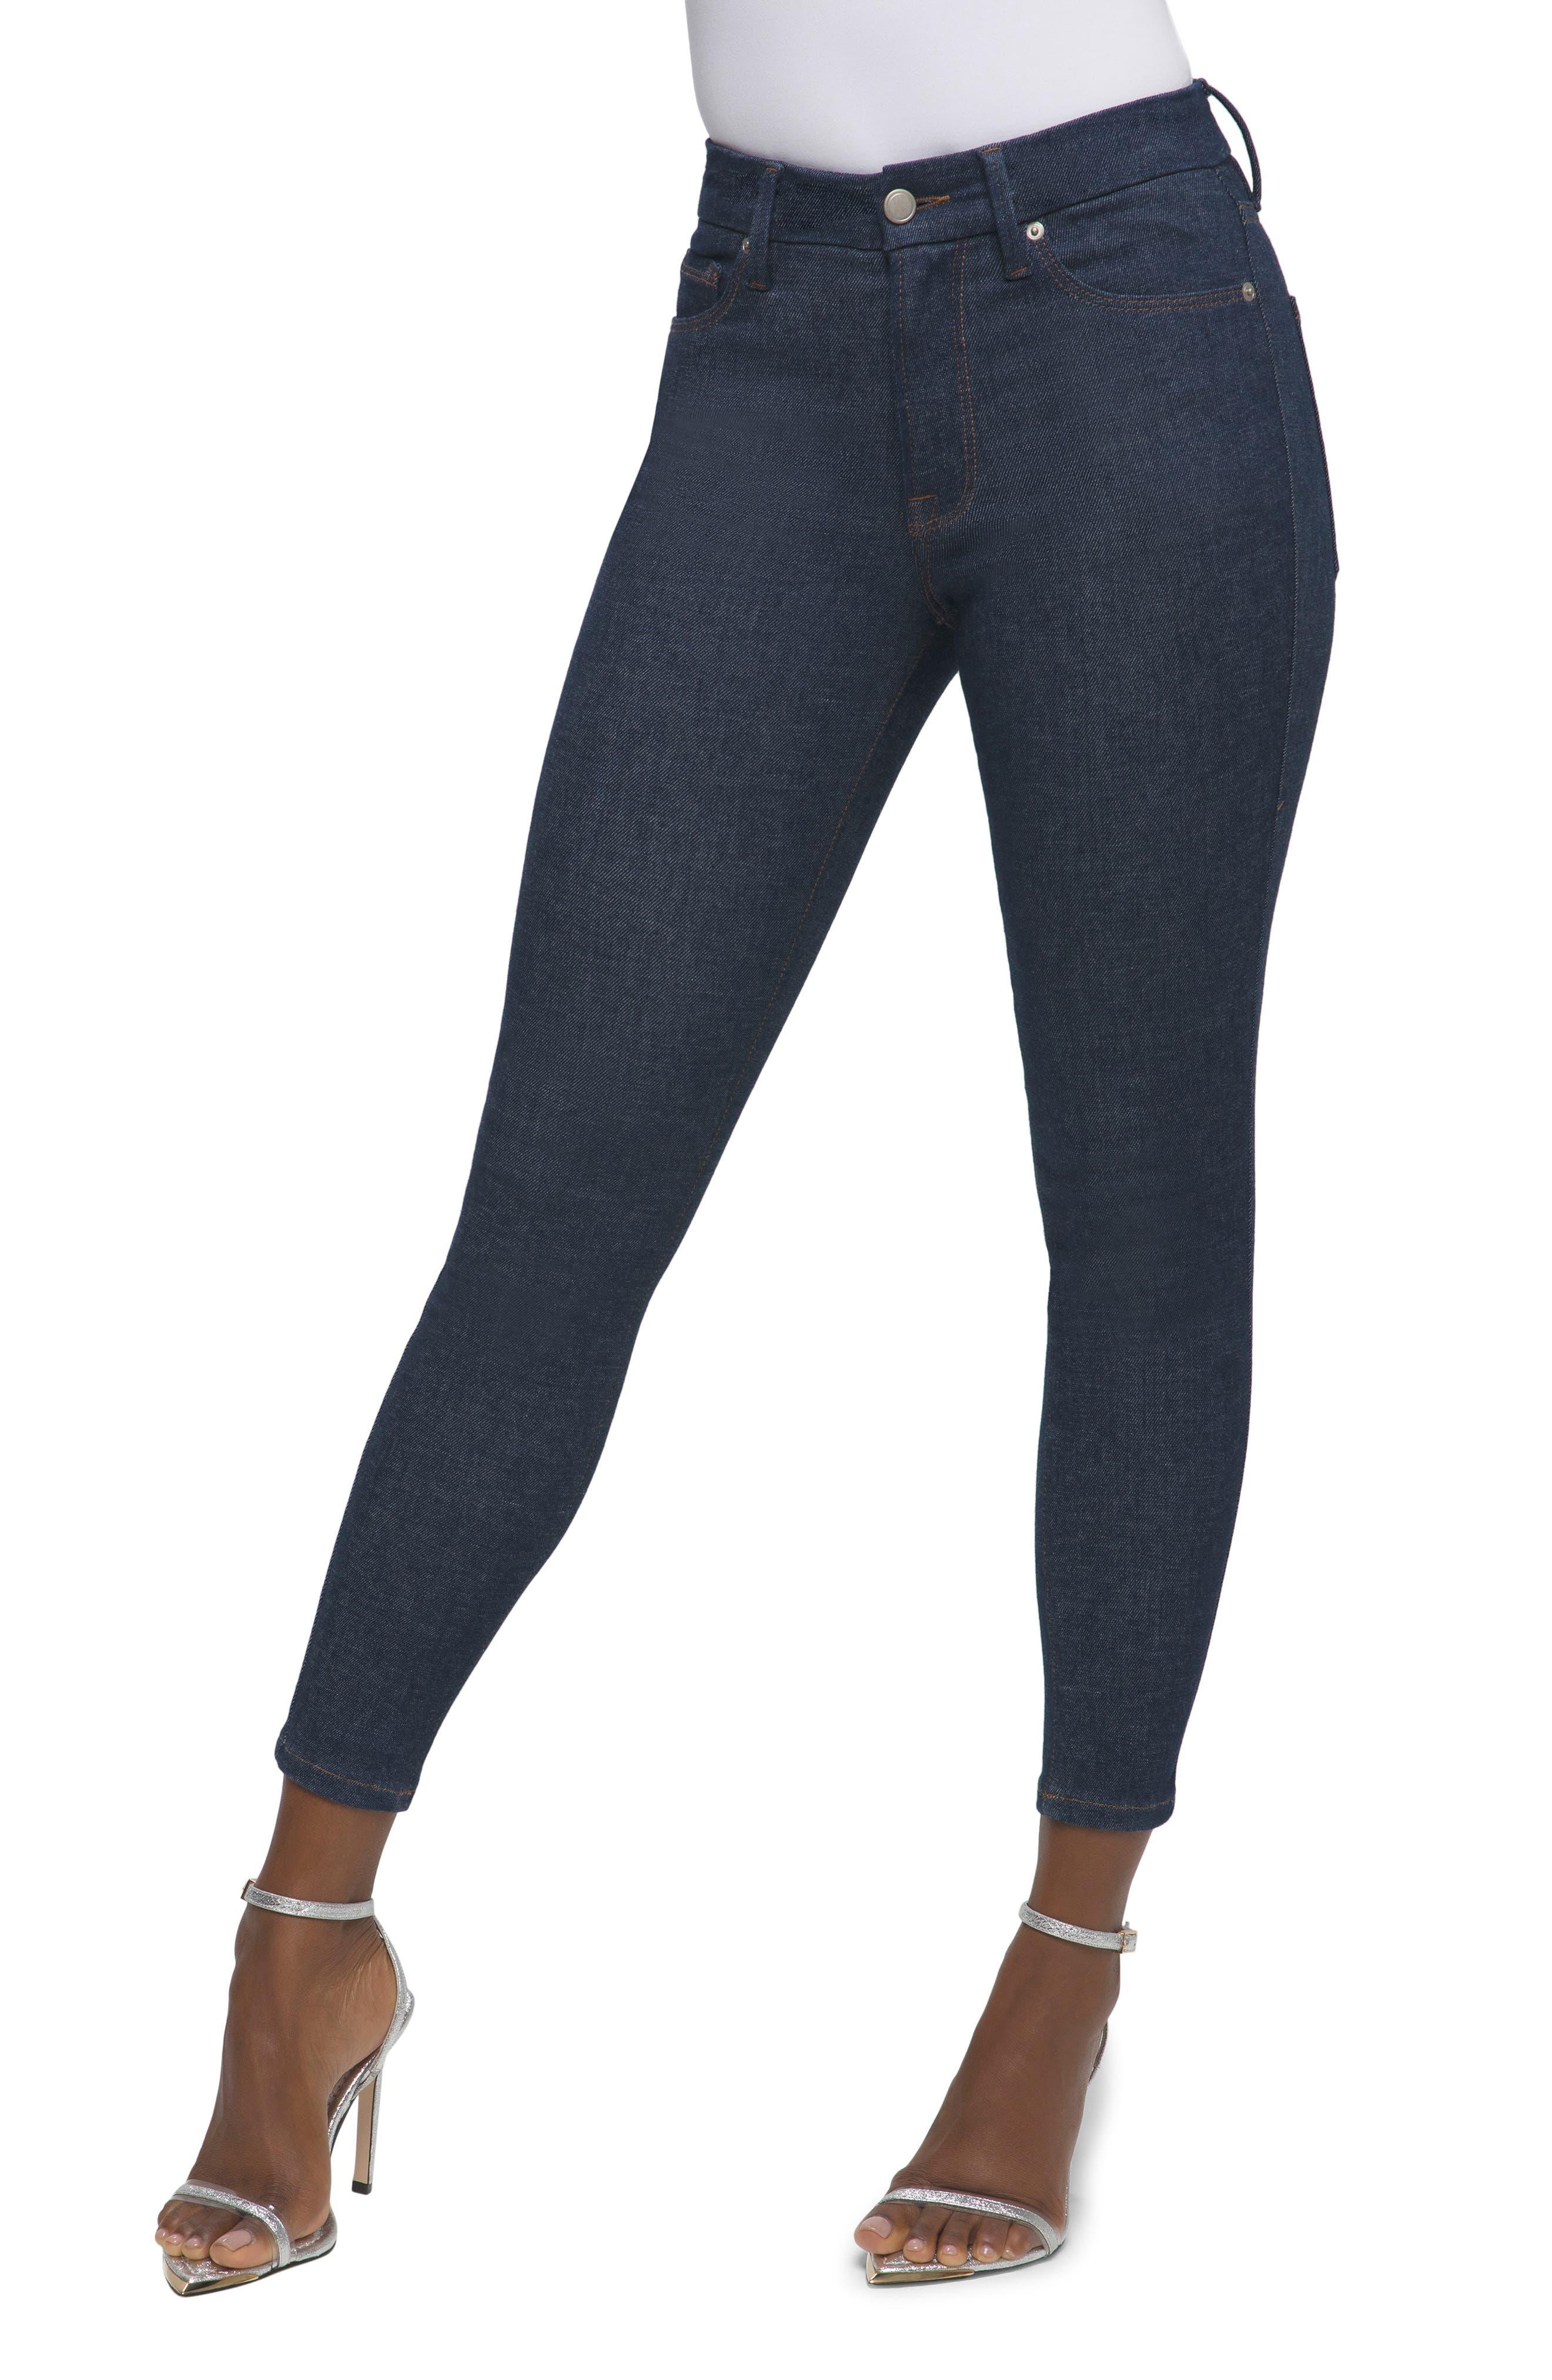 Women's Good American Always Fits Ankle Skinny Jeans